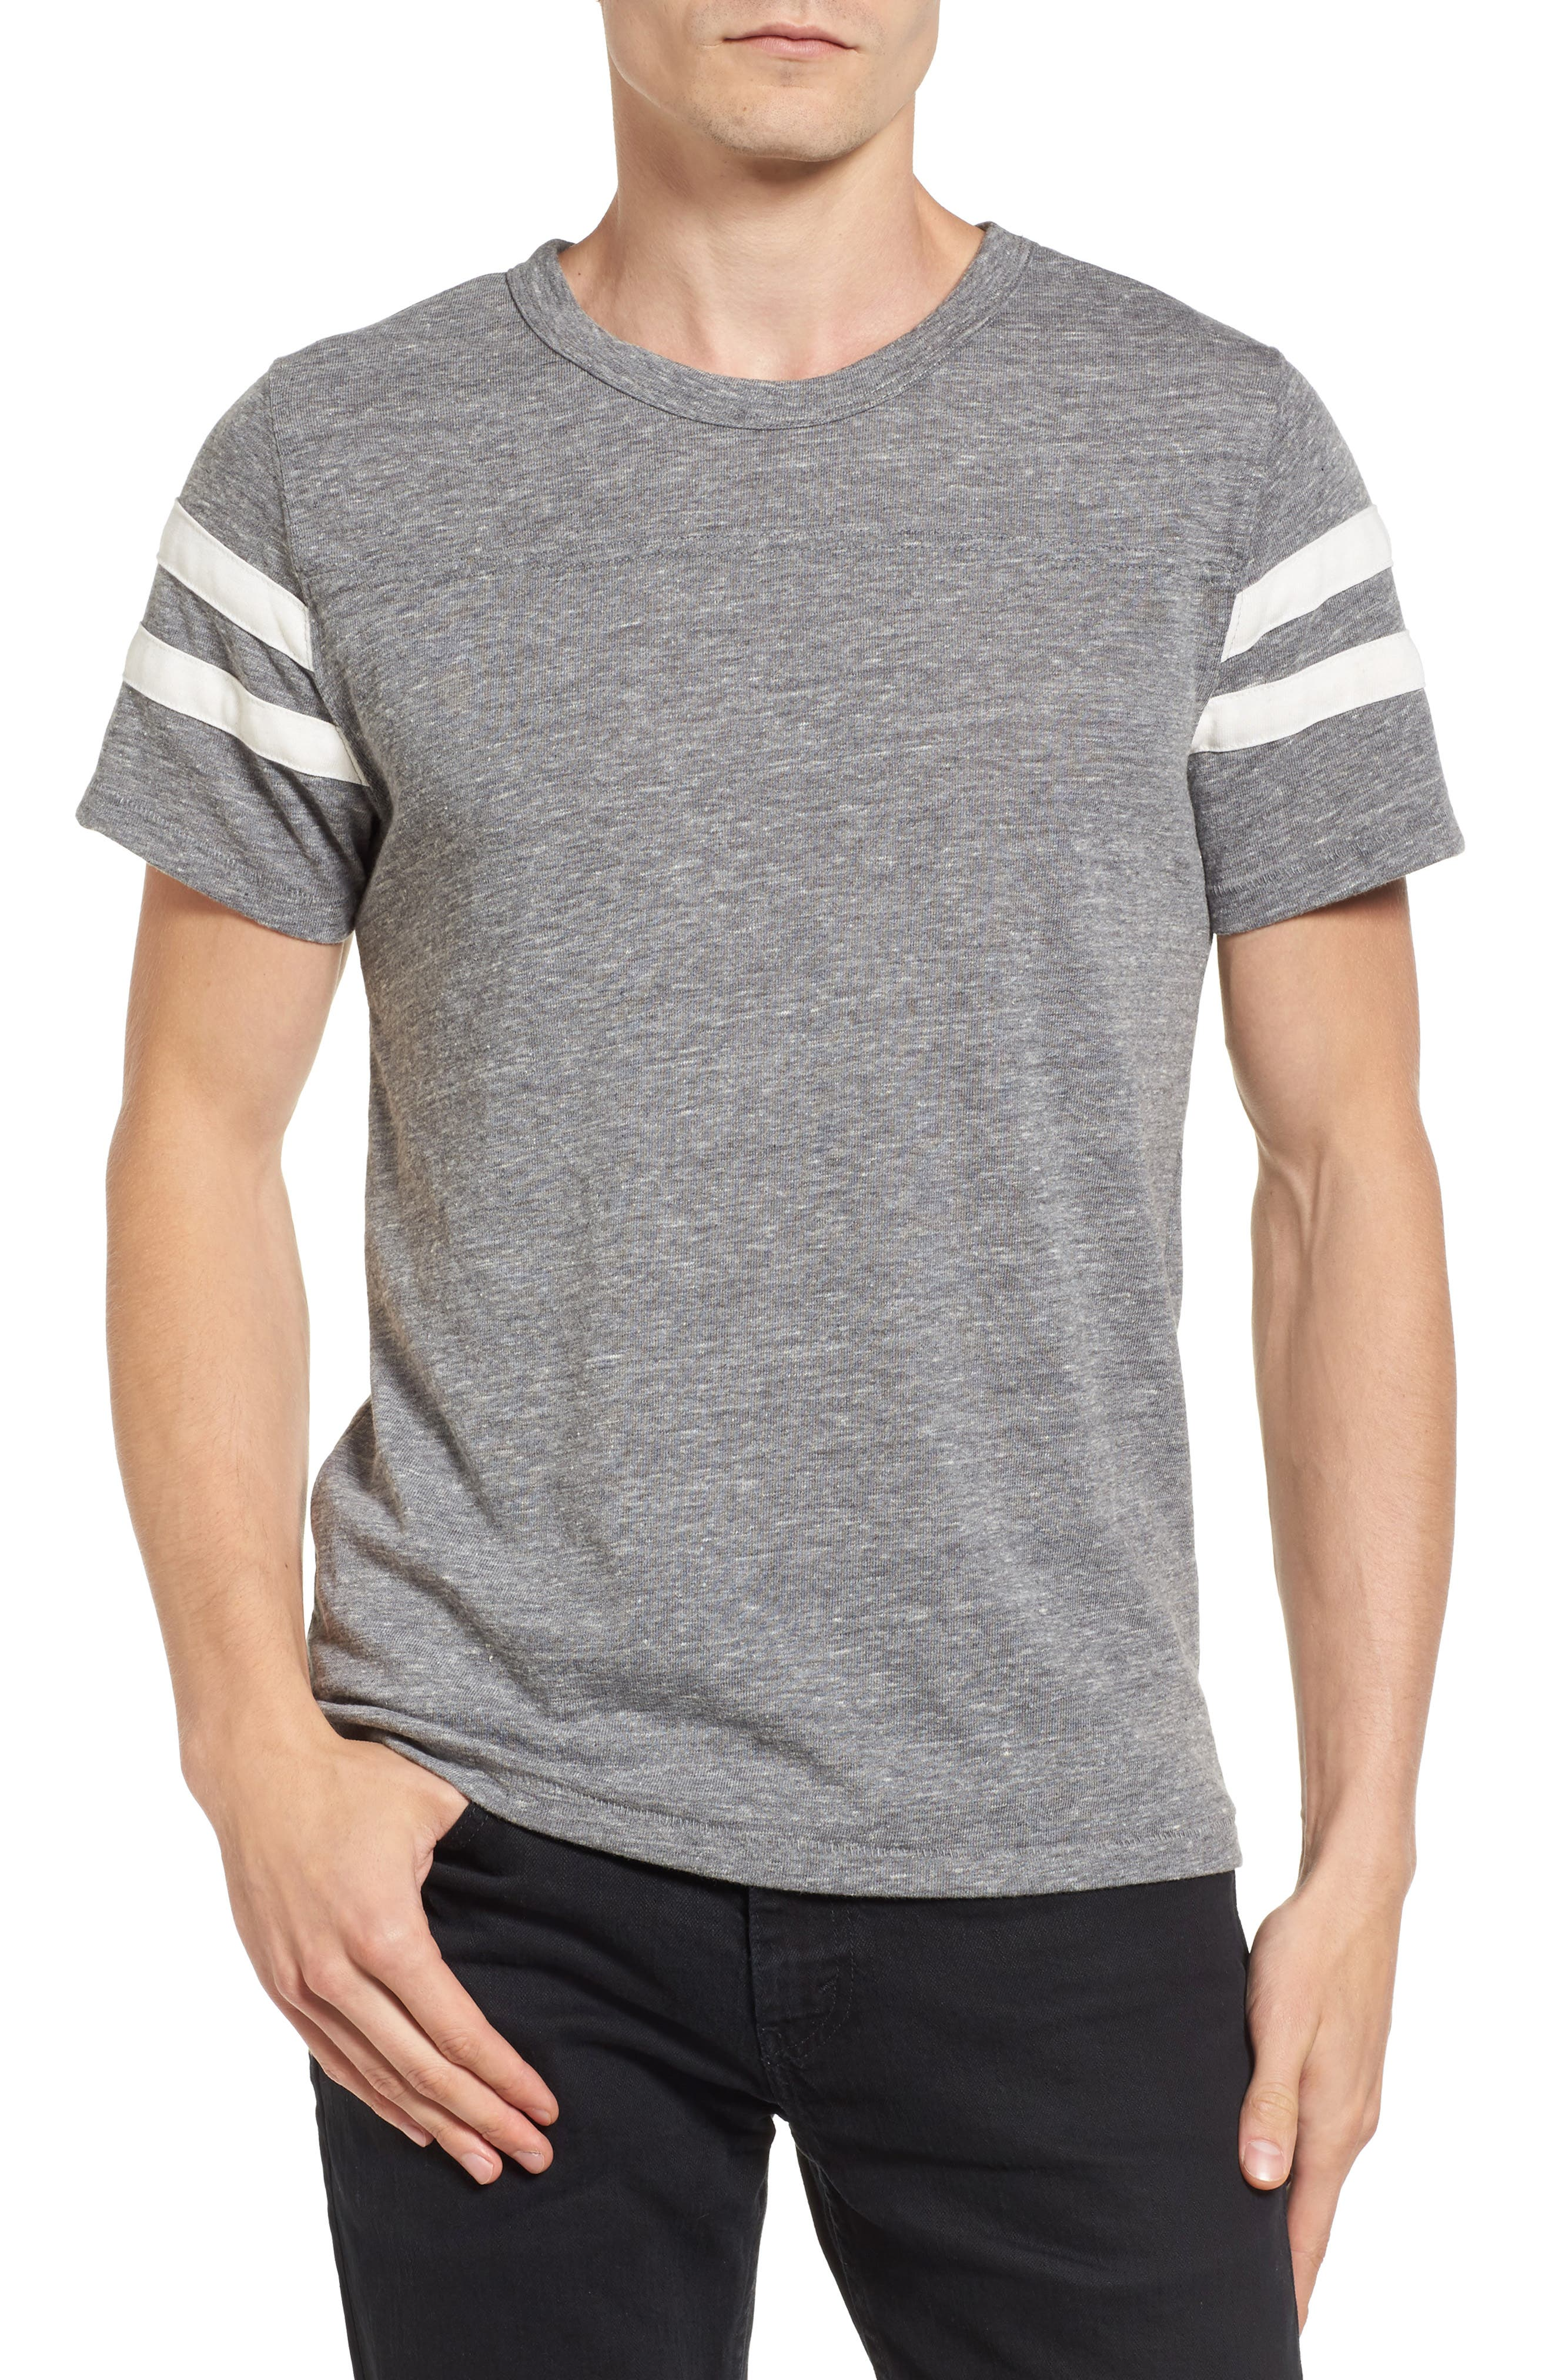 Football T-Shirt,                         Main,                         color, Eco Grey/ Eco Ivory